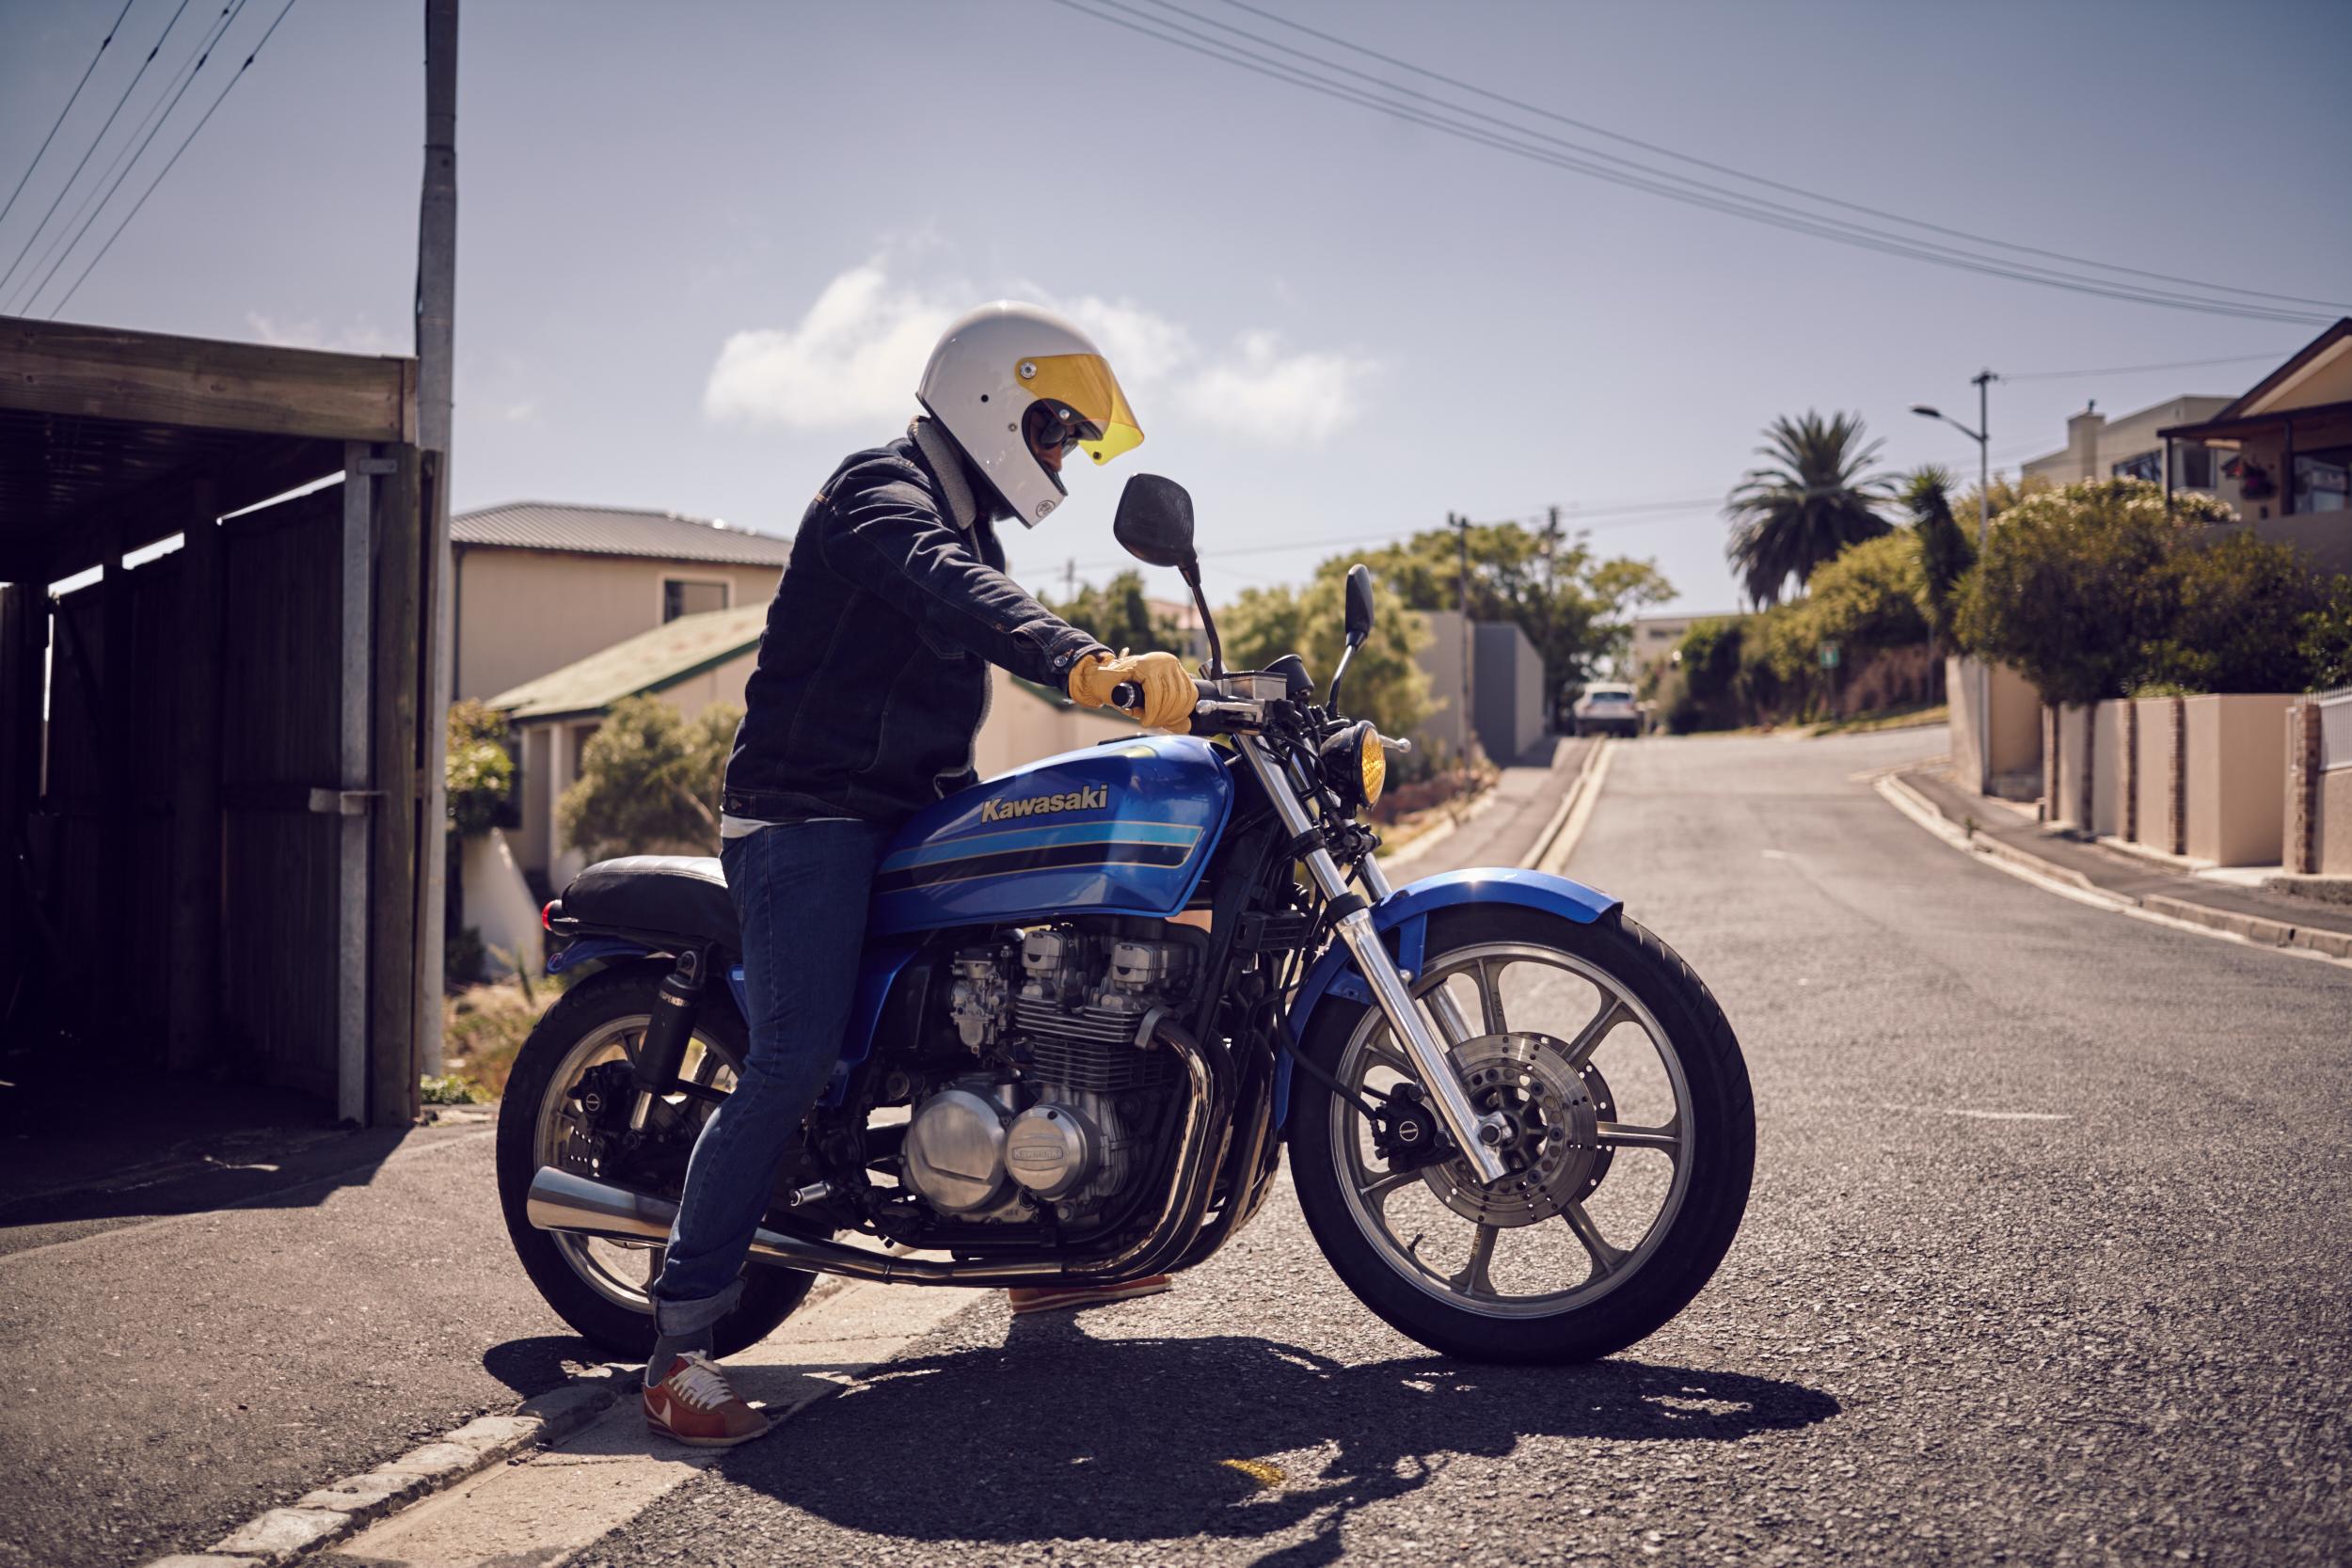 Martin's Ride | TheMotoSocialHAMBURG